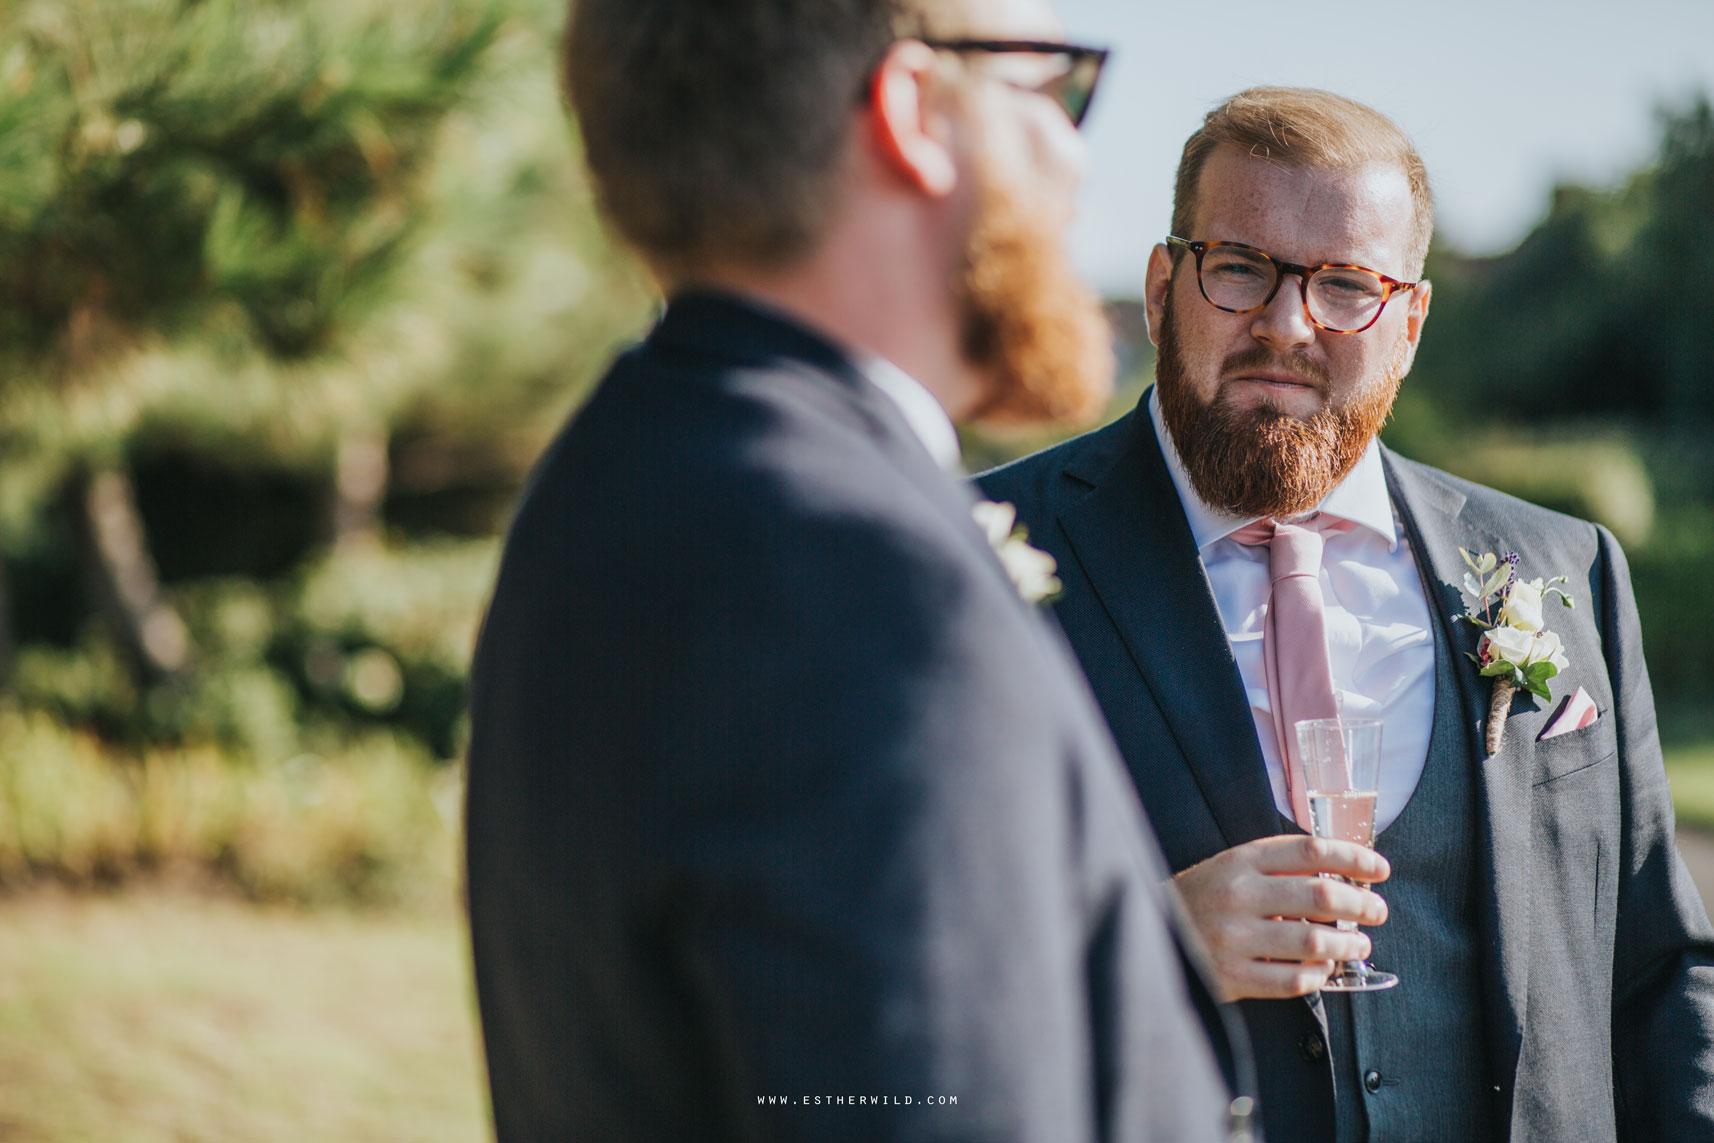 Cromer_Wedding_Beach_Outdoor_Ceremony_Norfolk_North_Lodge_Registry_Office_Rocket_House_Cafe_Cromer_Pier_IMG_4268_IMGL8233.jpg